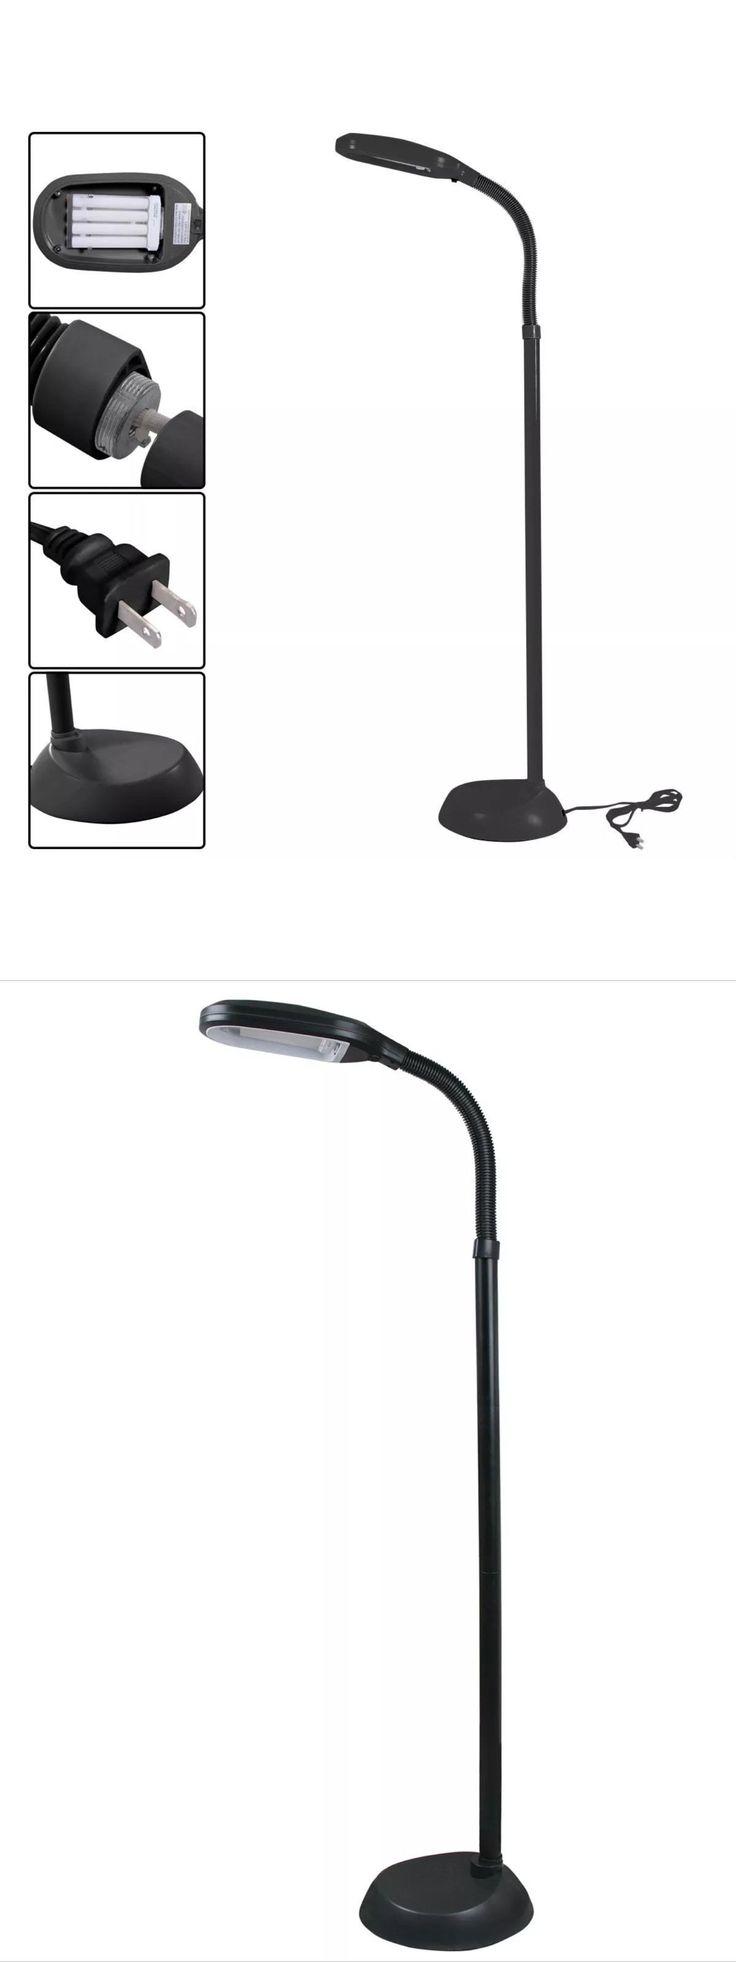 False Eyelashes and Adhesives: Eyelash Extension Kit Floor Beauty Lamp Furniture Equipment Glue (Bright Light) BUY IT NOW ONLY: $59.99